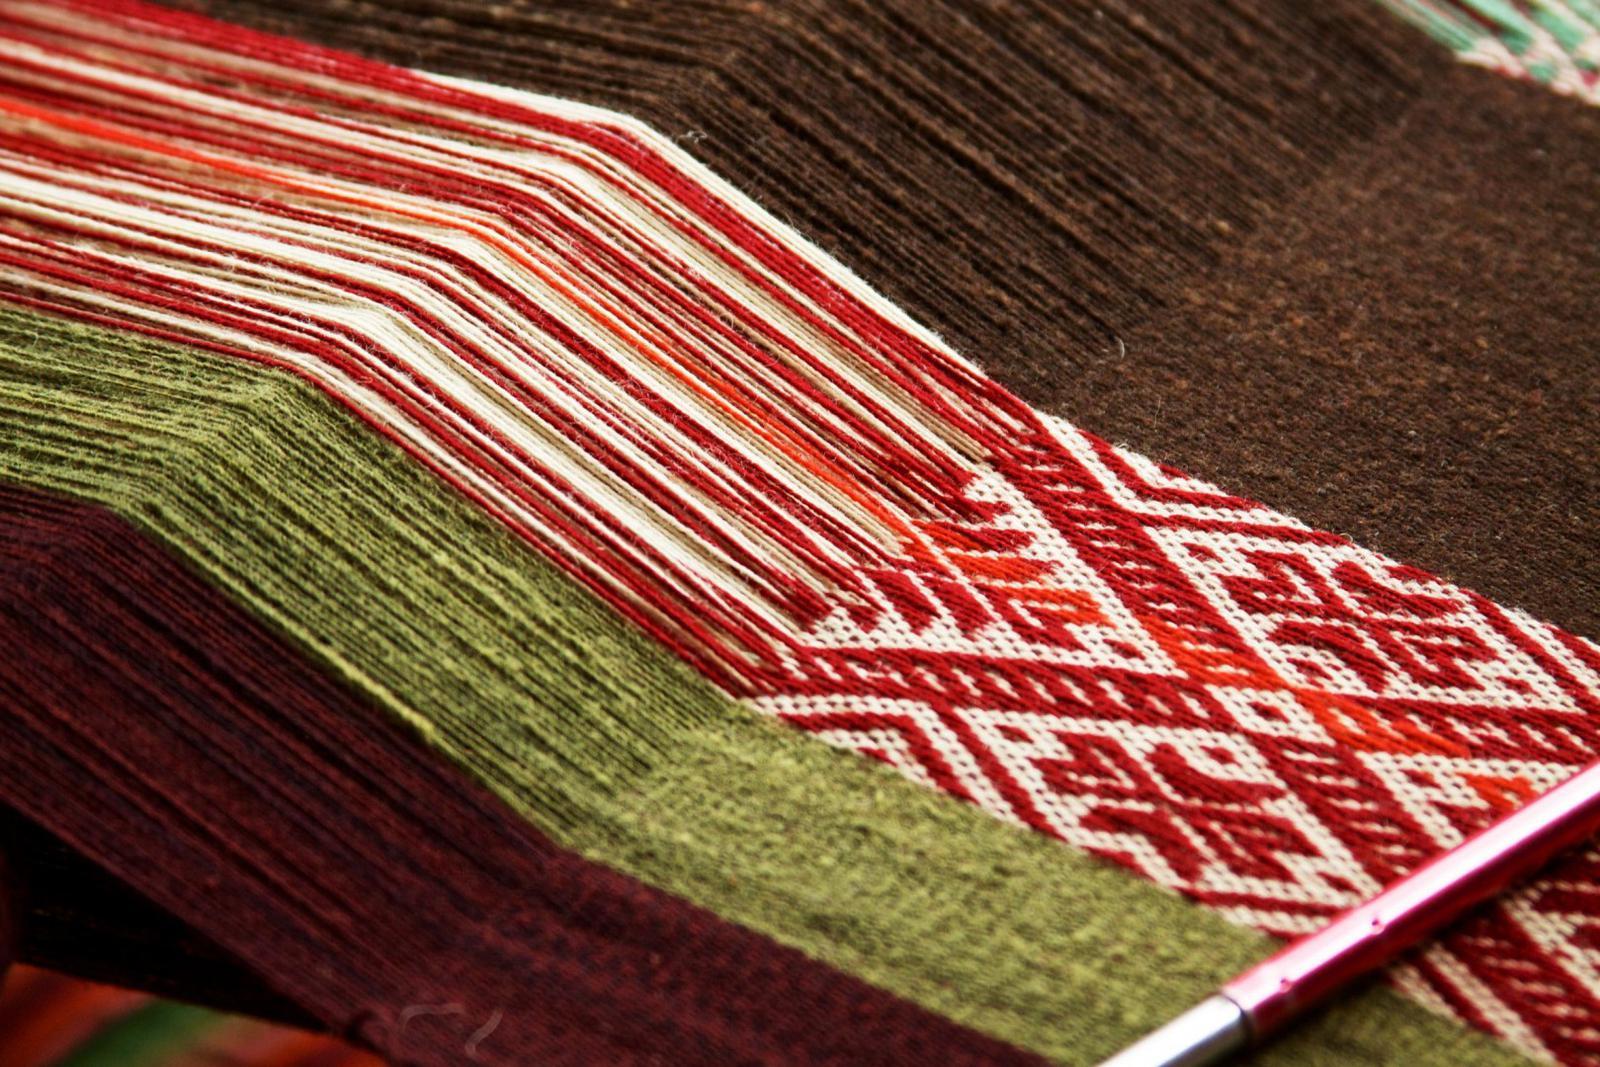 Custom-made threads